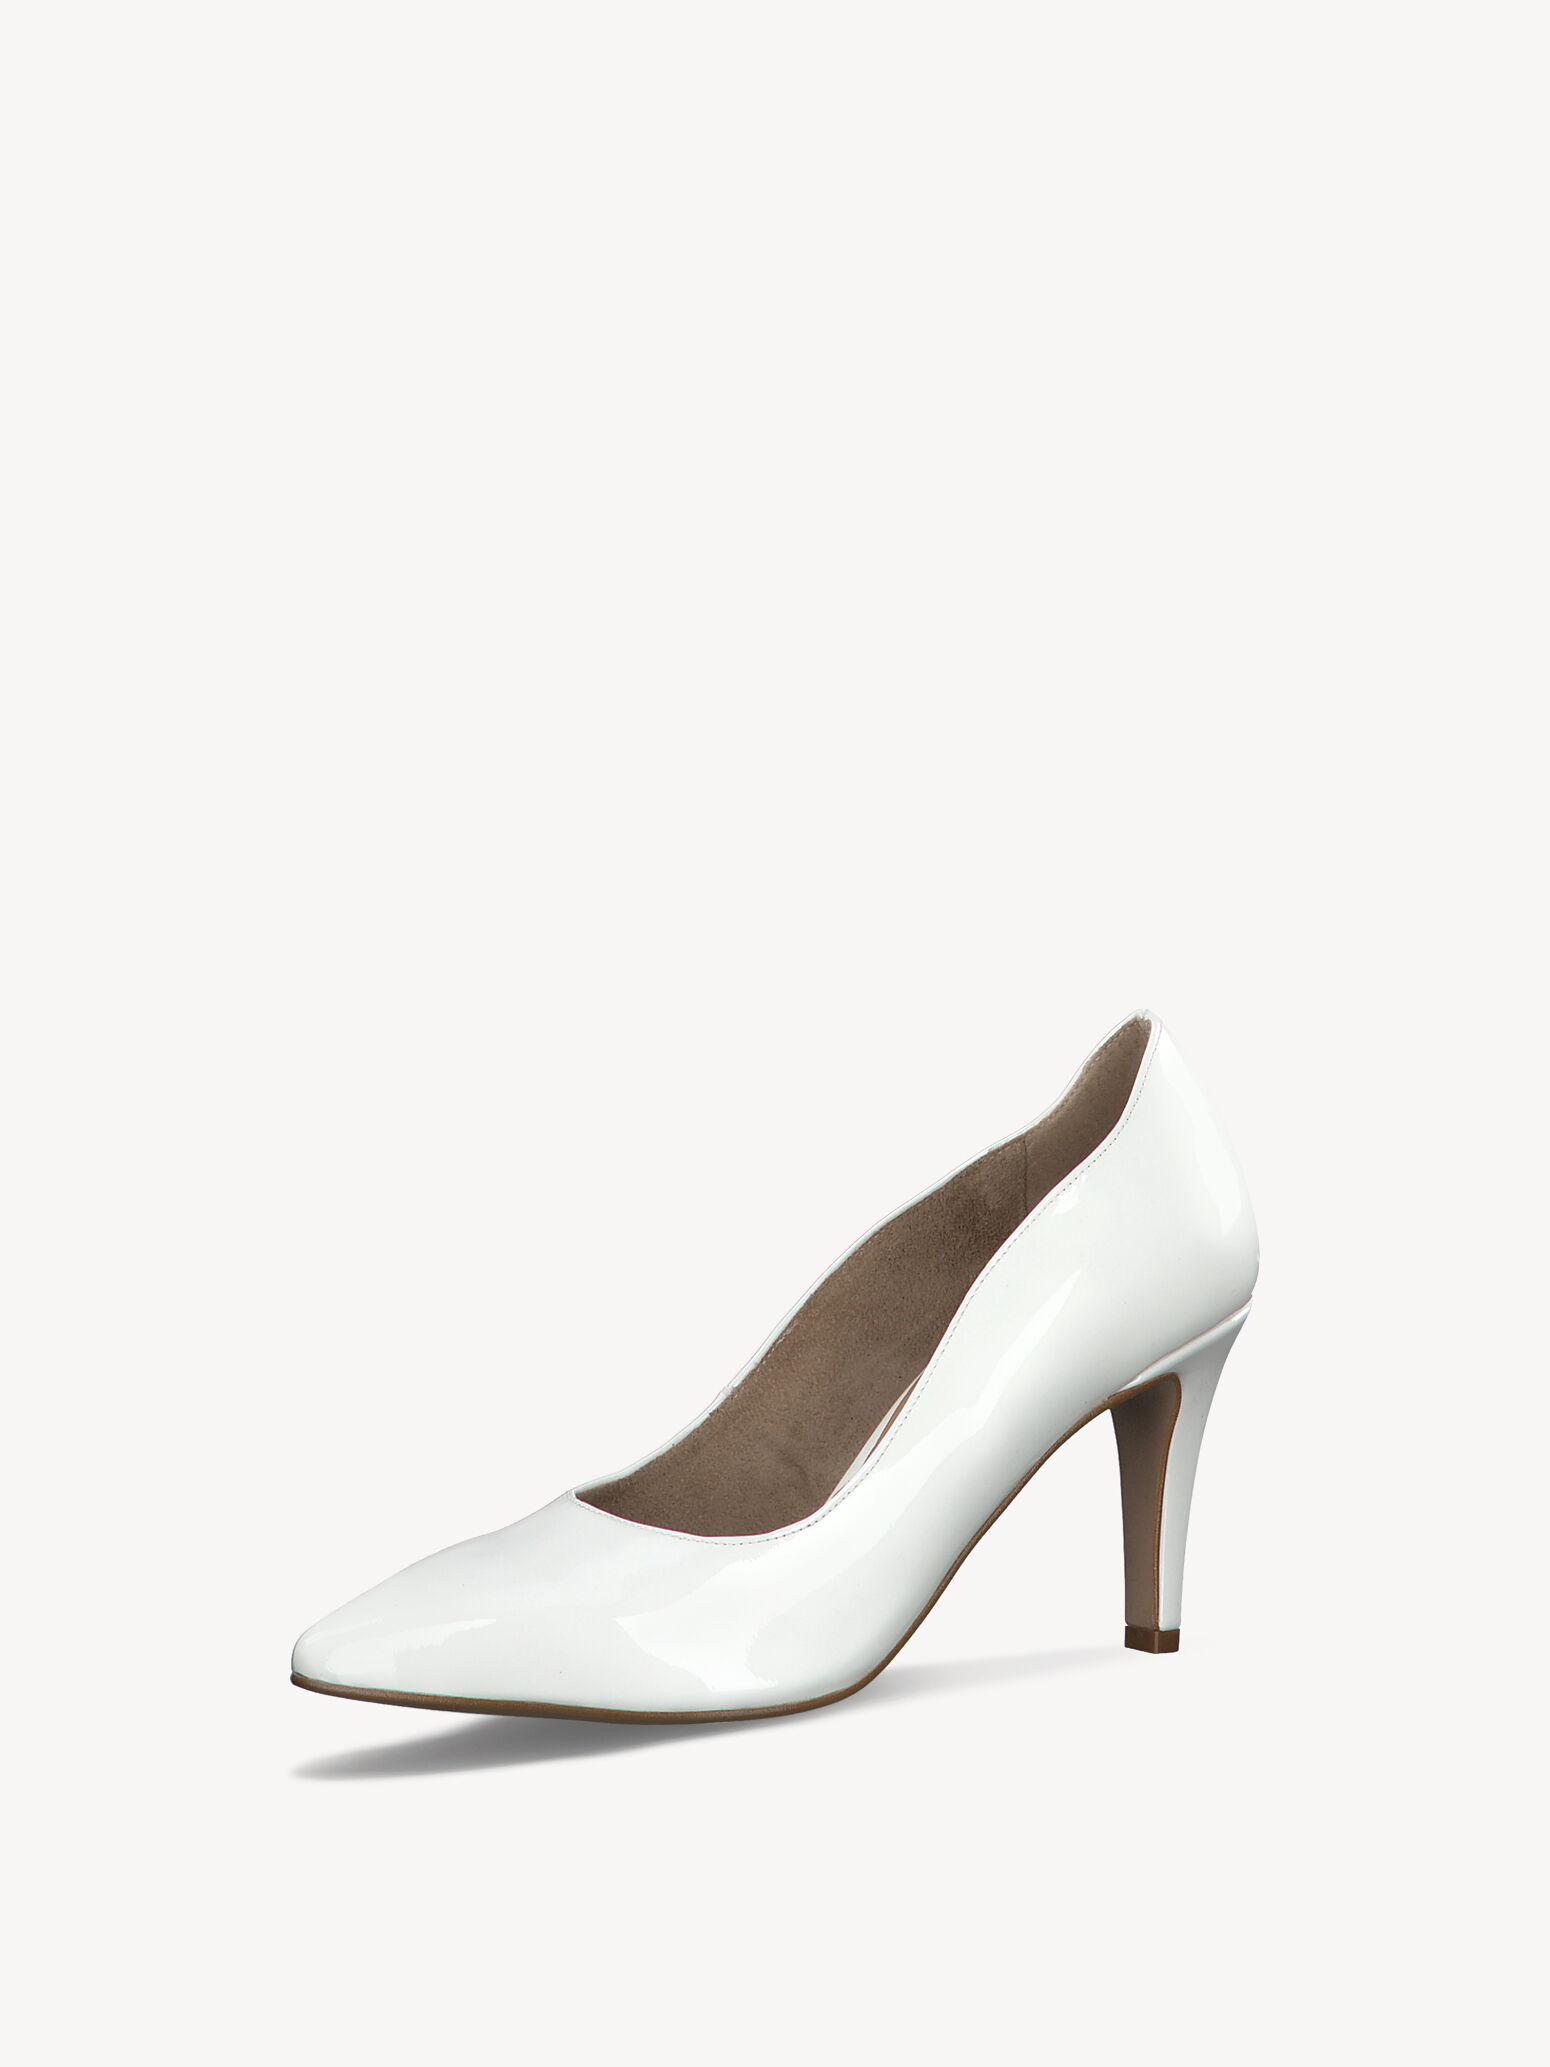 Tamaris Damen Pumps Caxias 22418 22 edler Velours-Look Schuhe schwarz